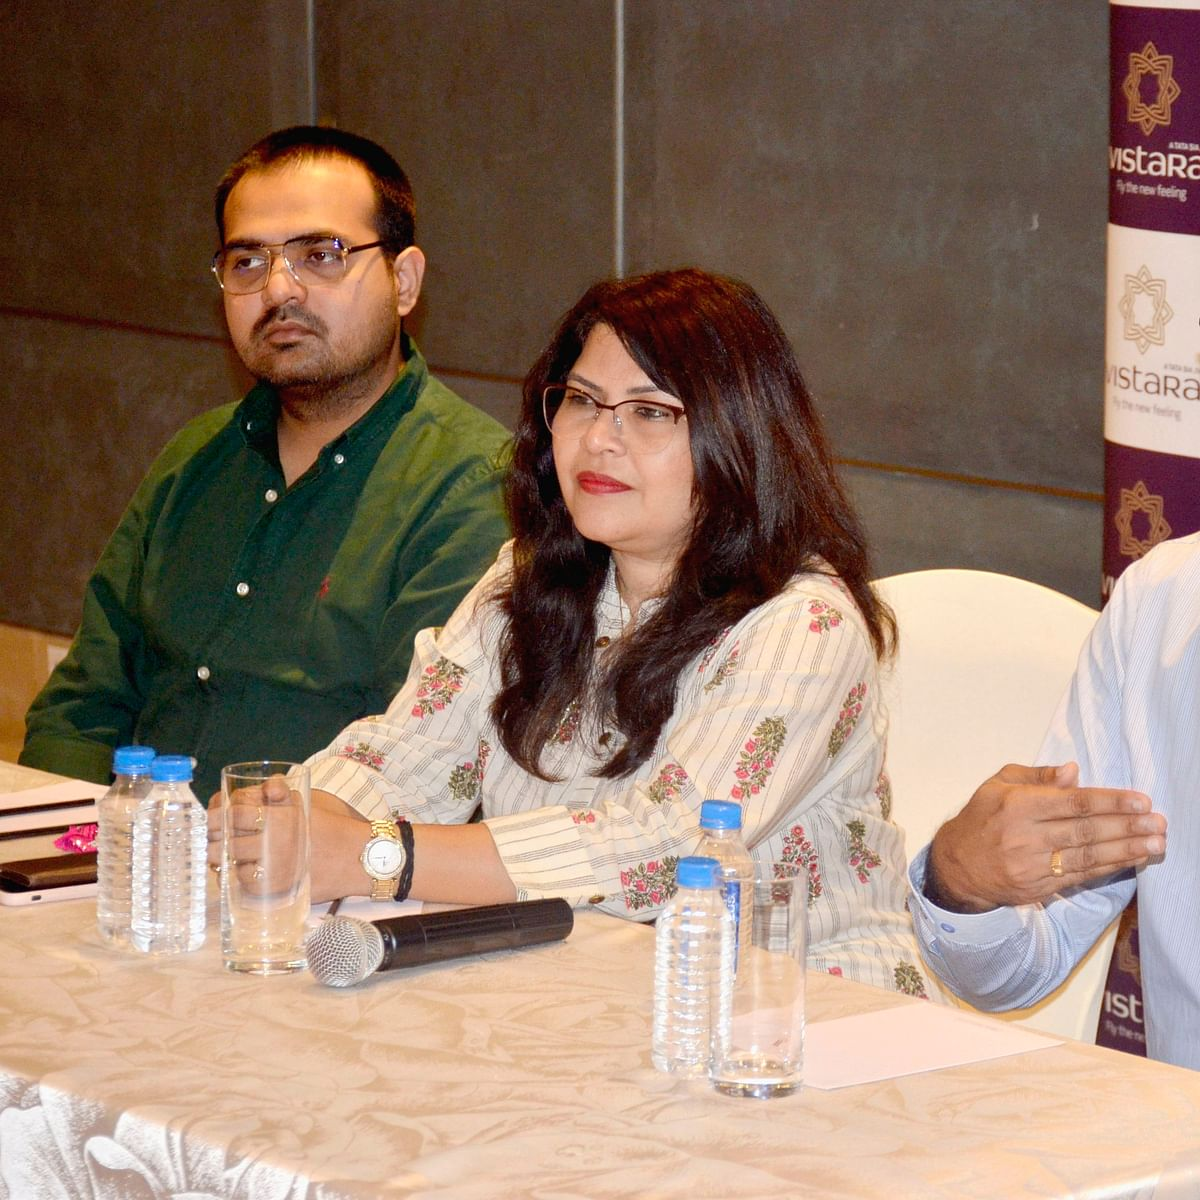 Indore: Passengers get 11th direct flight to New Delhi